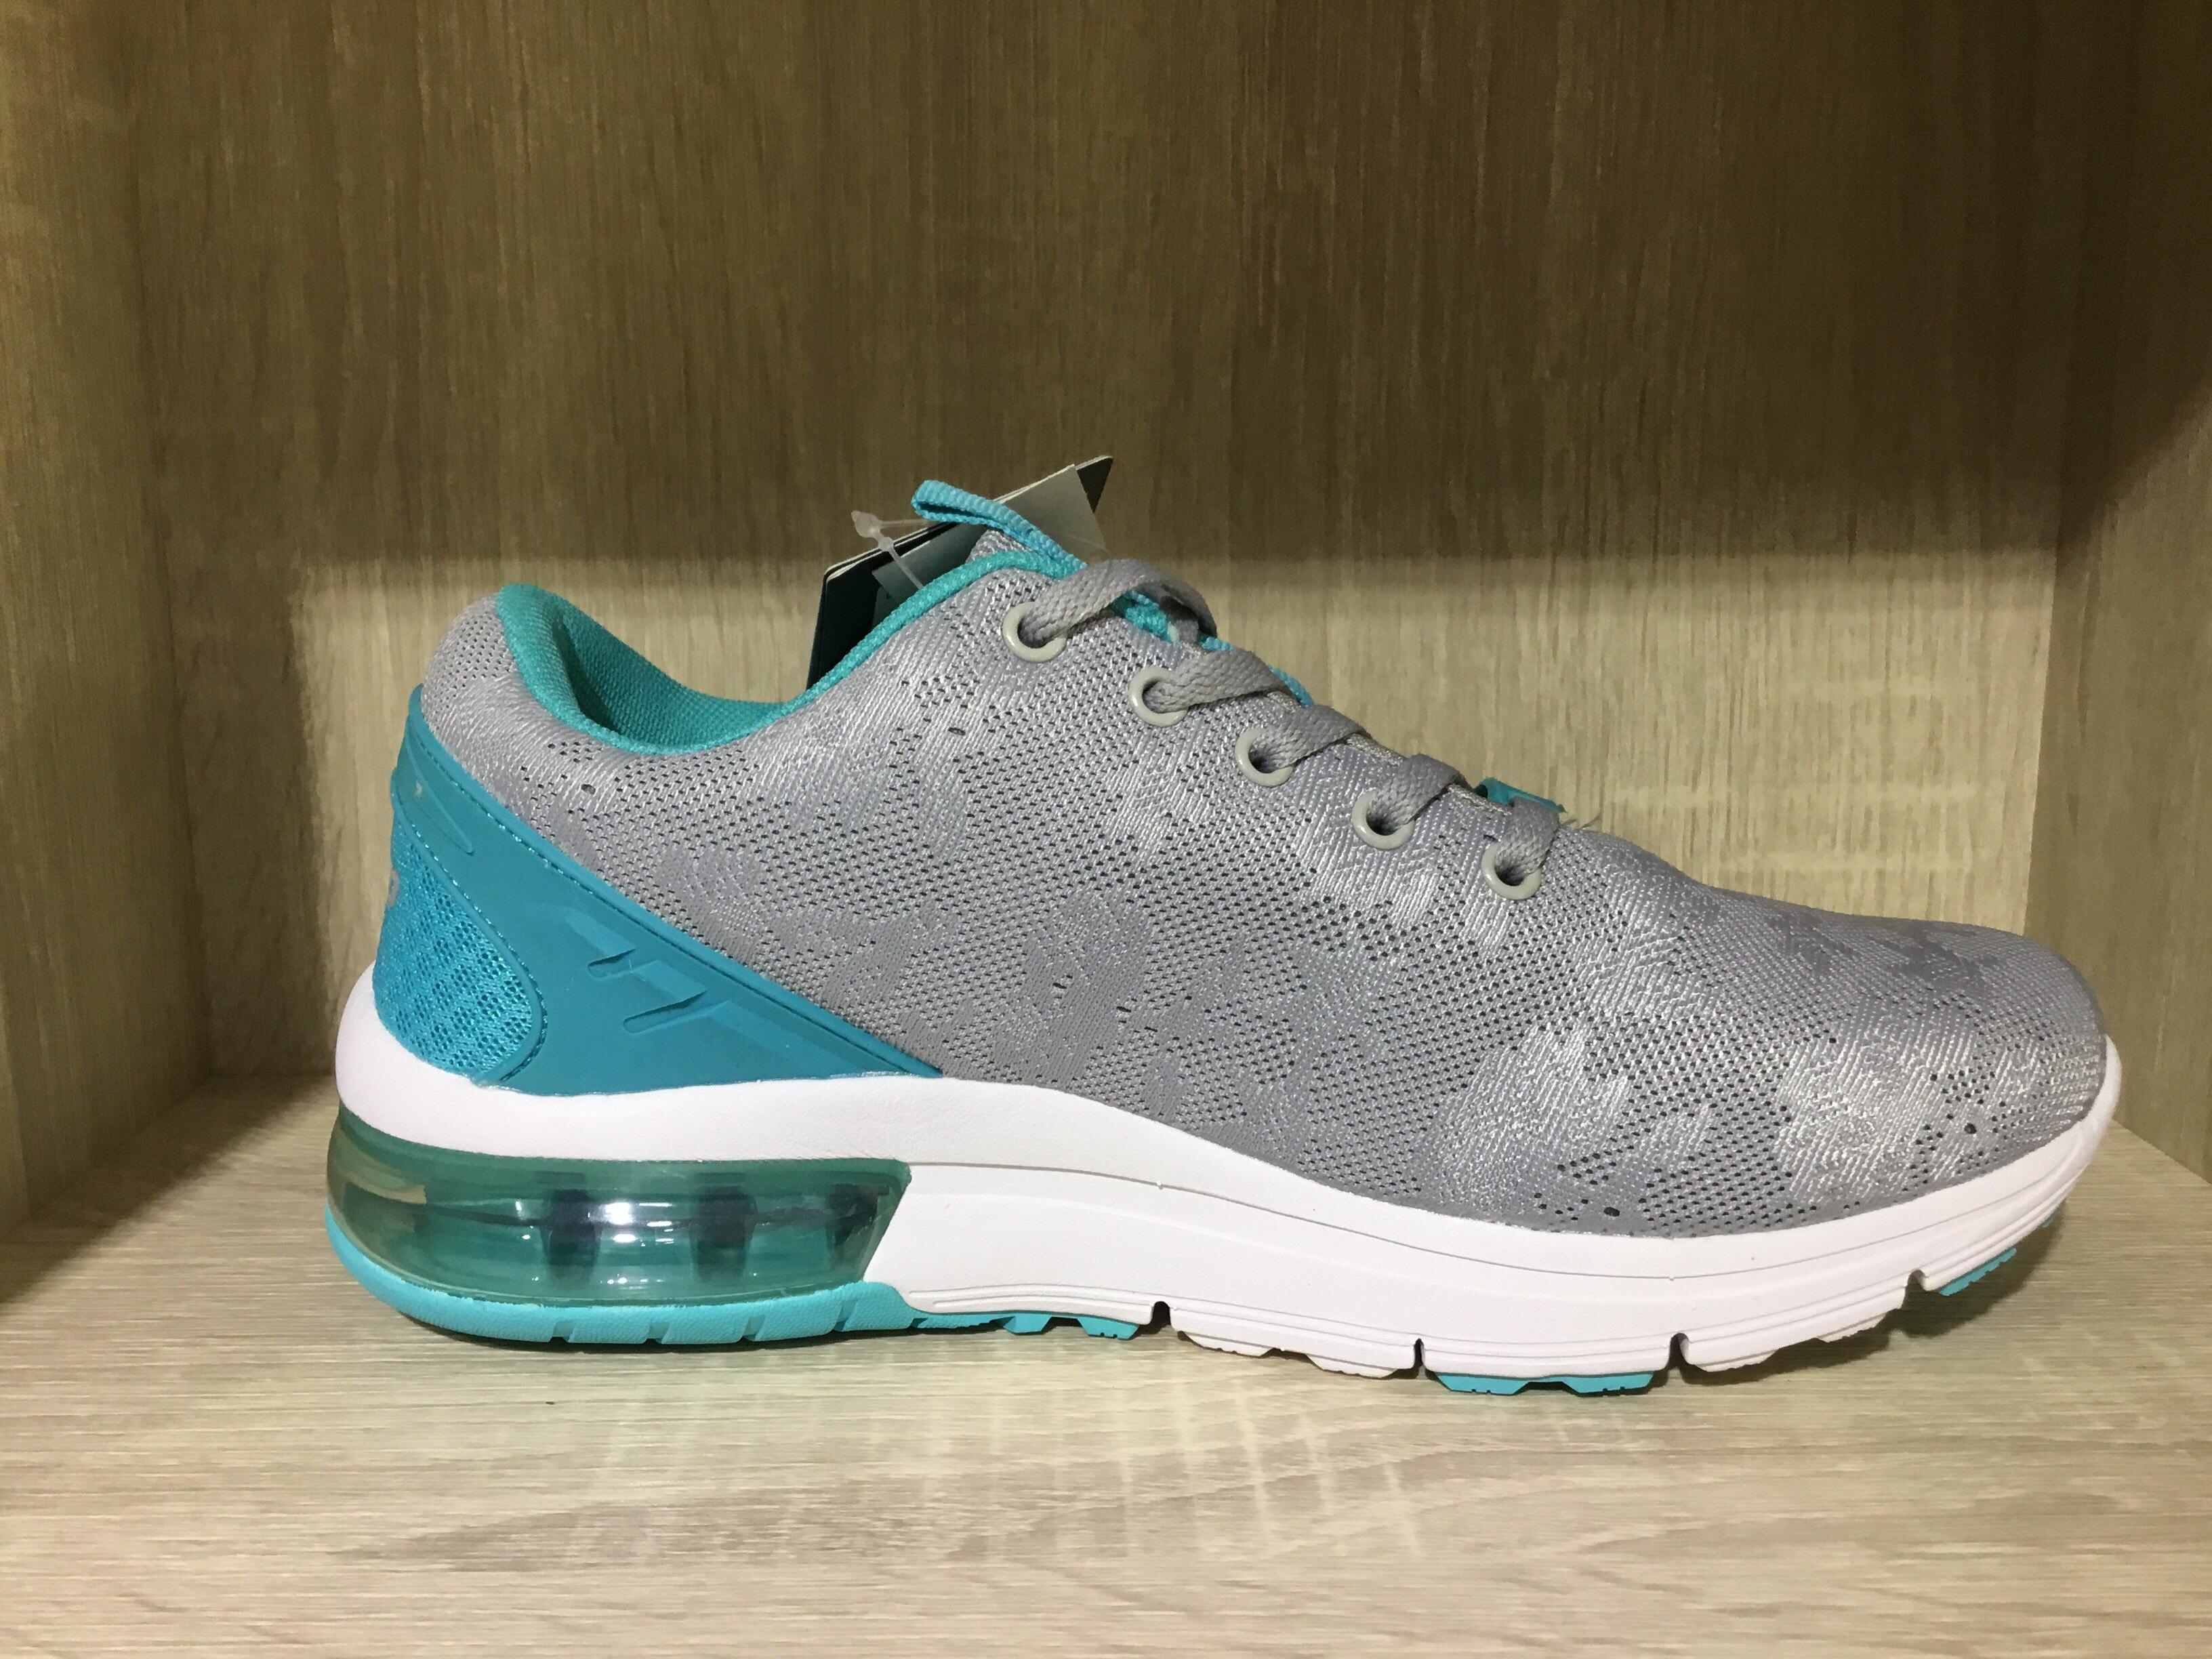 Lotto Aria Chino 氣墊跑鞋